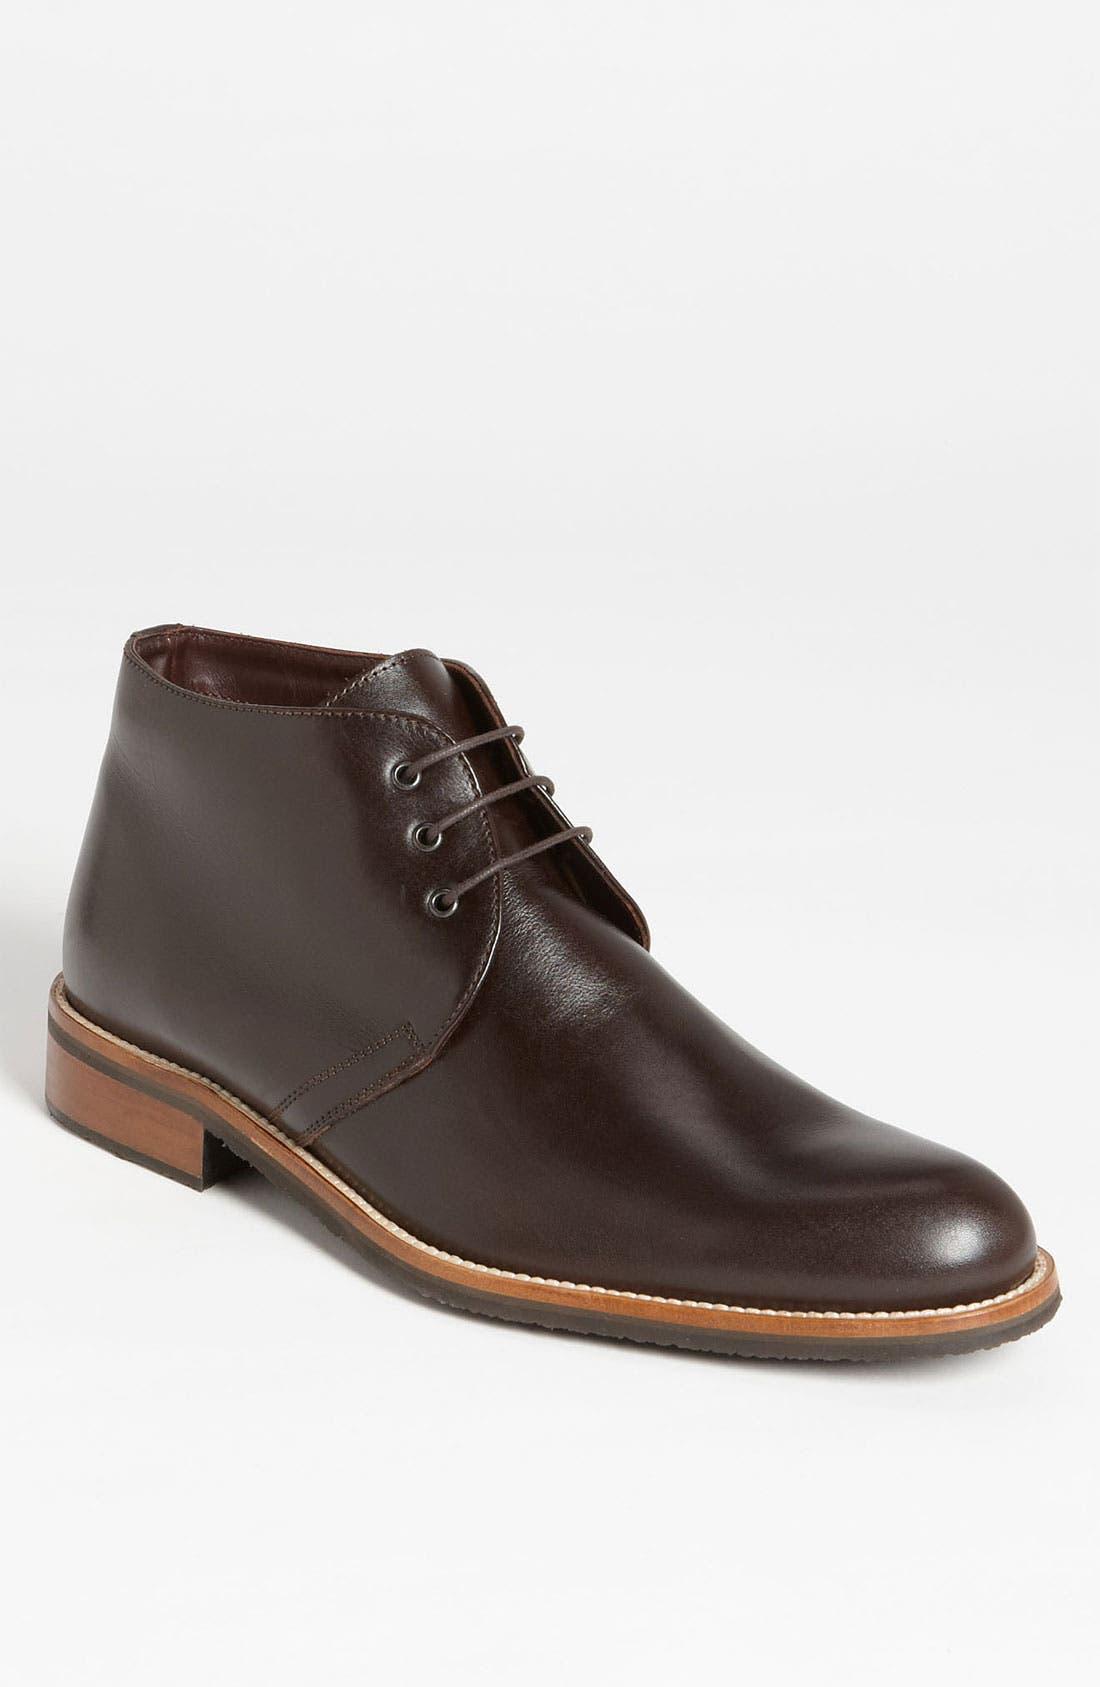 Alternate Image 1 Selected - Thomas Dean Polished Chukka Boot